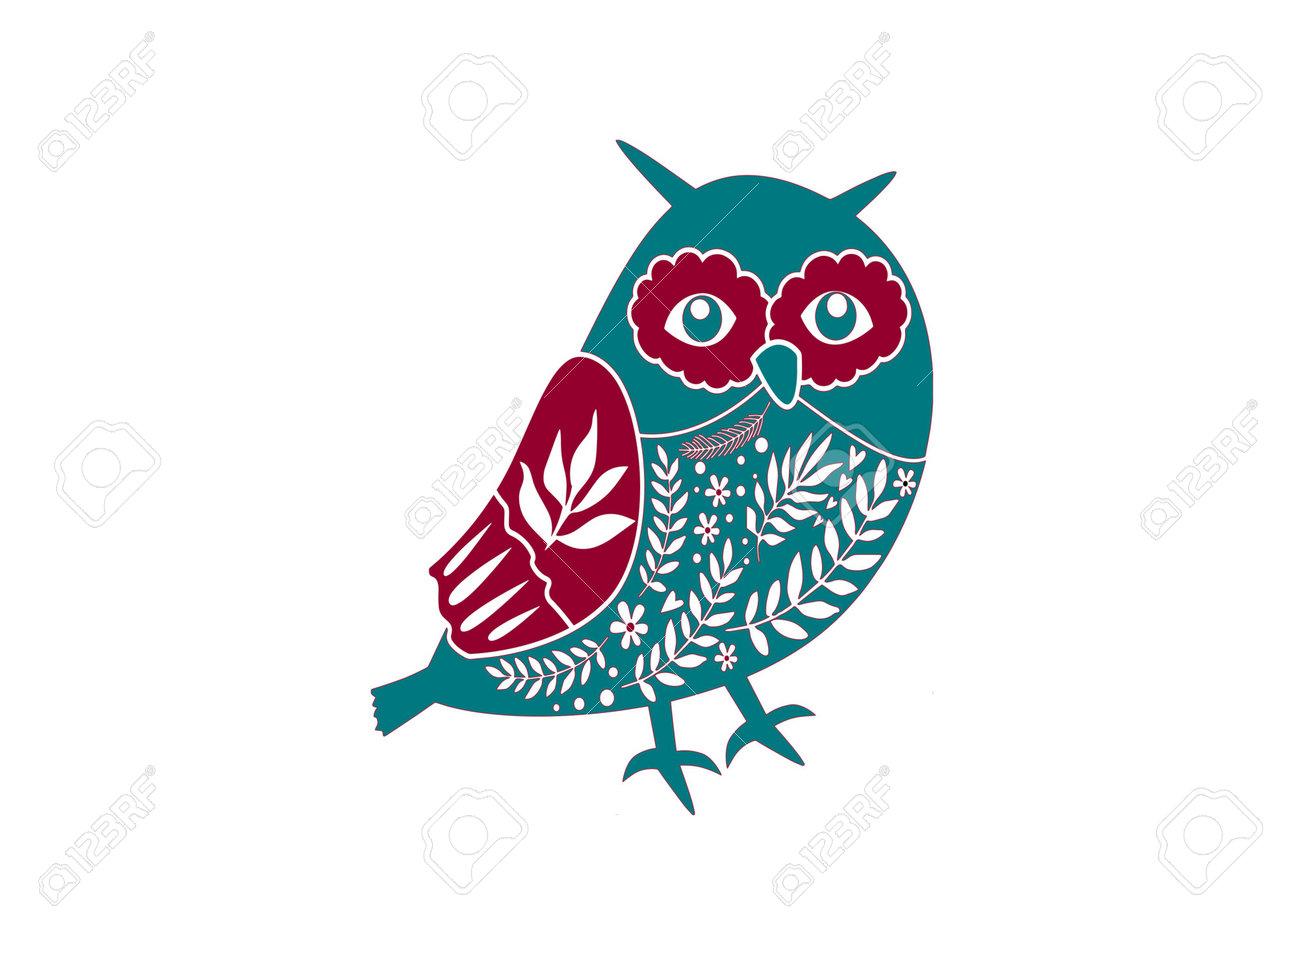 christmas owl on white background - 3d rendering - 162166038